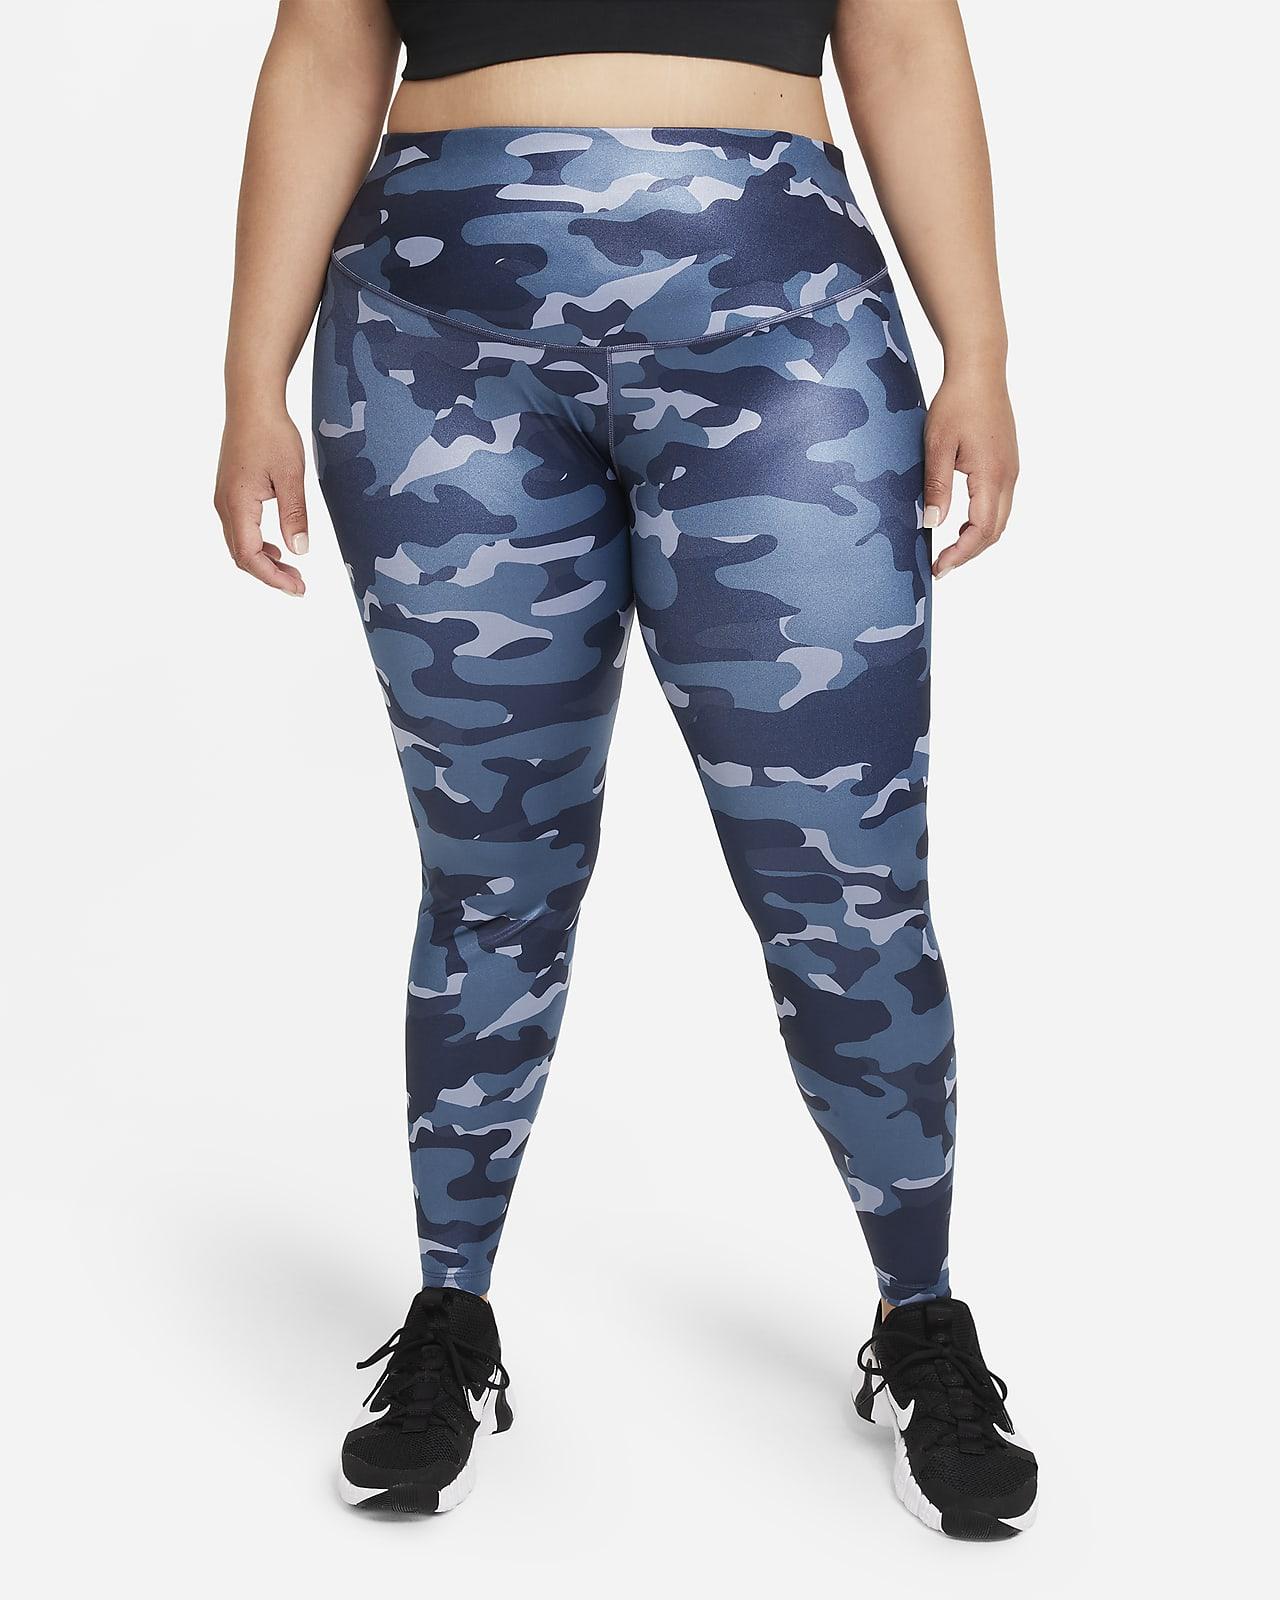 Nike Dri-FIT One Women's Mid-Rise Camo Leggings (Plus Size)